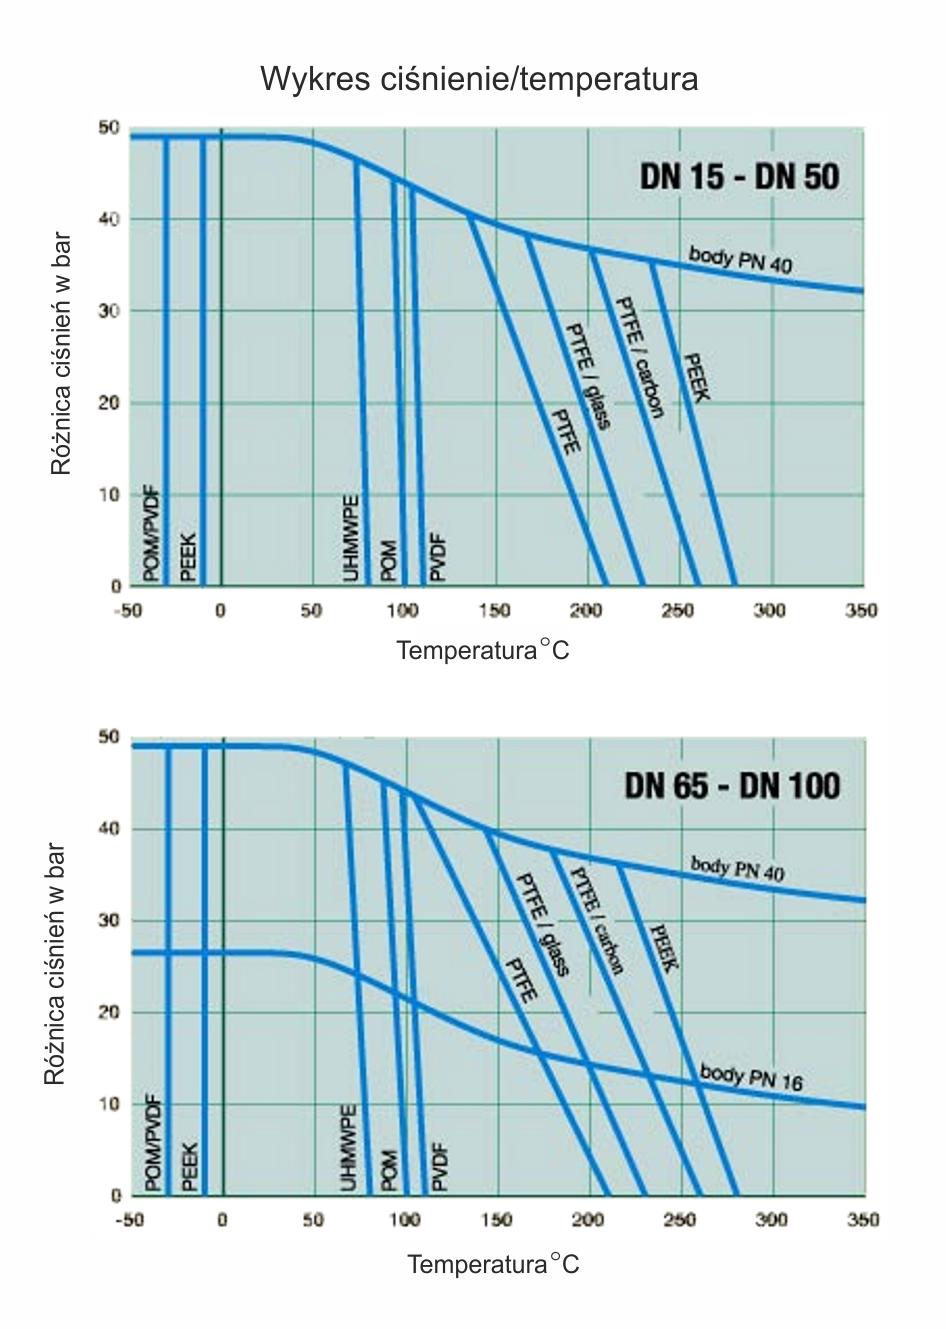 FG wykres